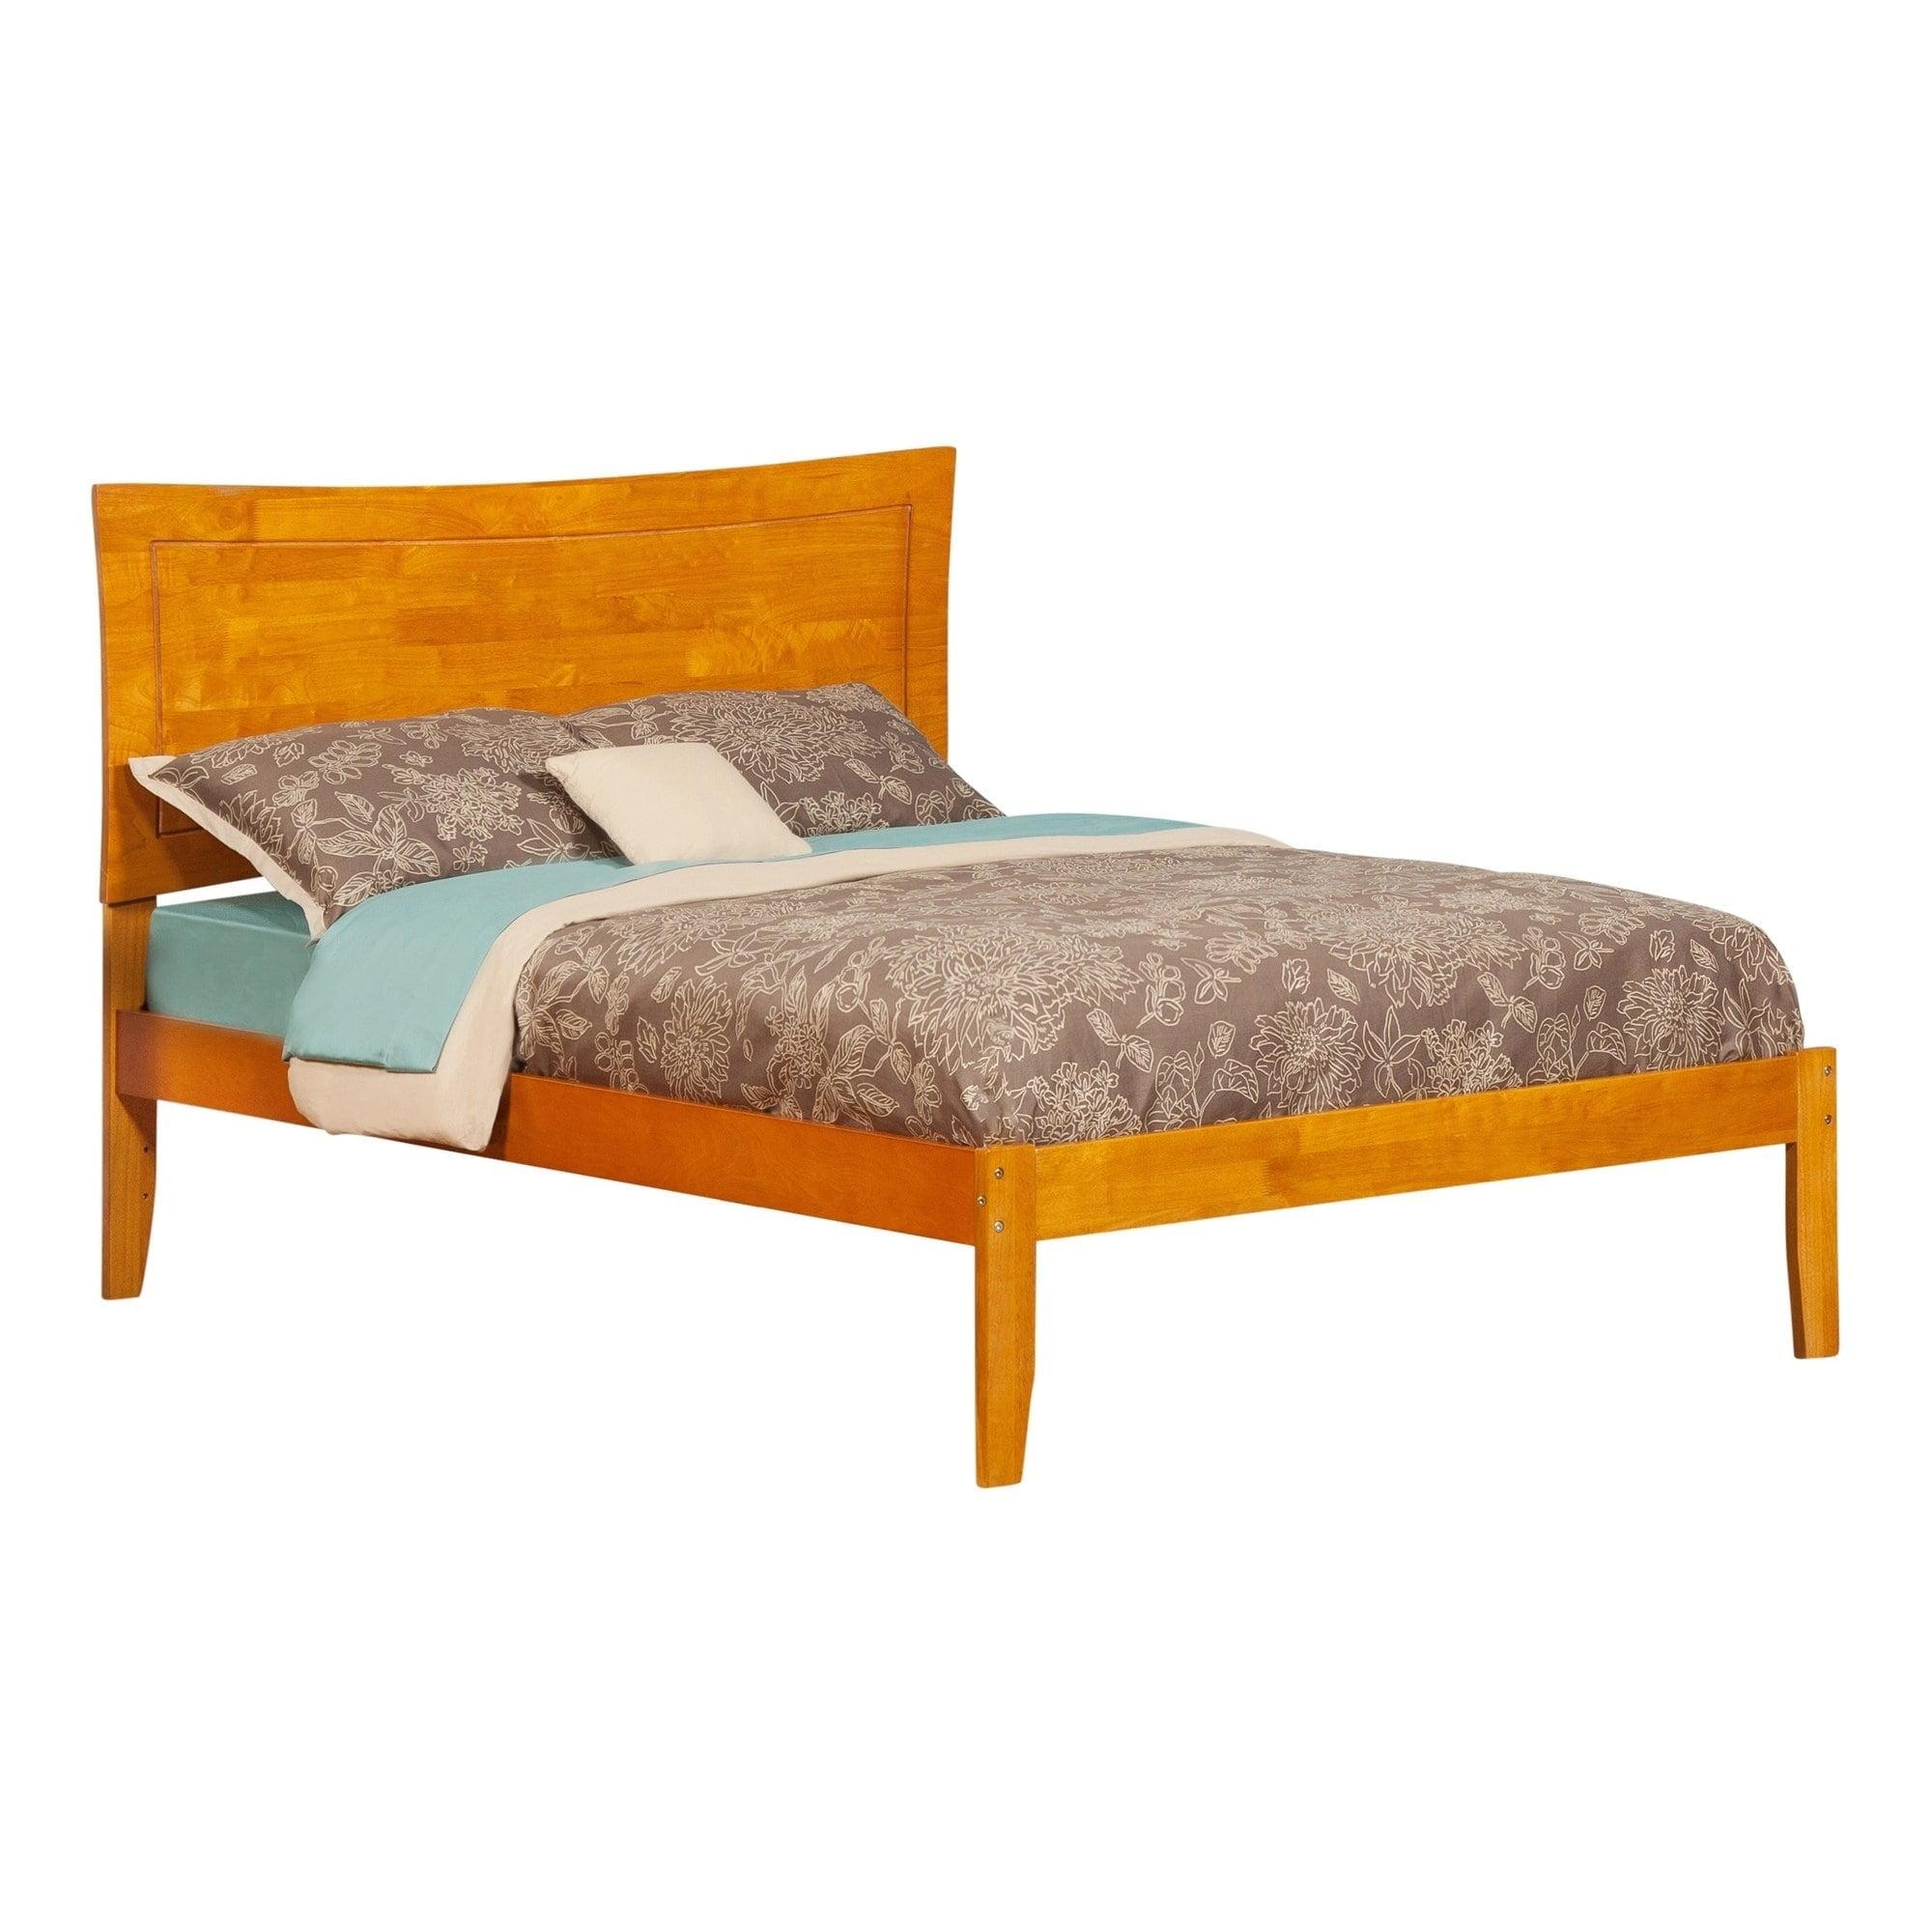 Atlantic Furniture Metro Caramel Latte Full-sized Open-foot Bed